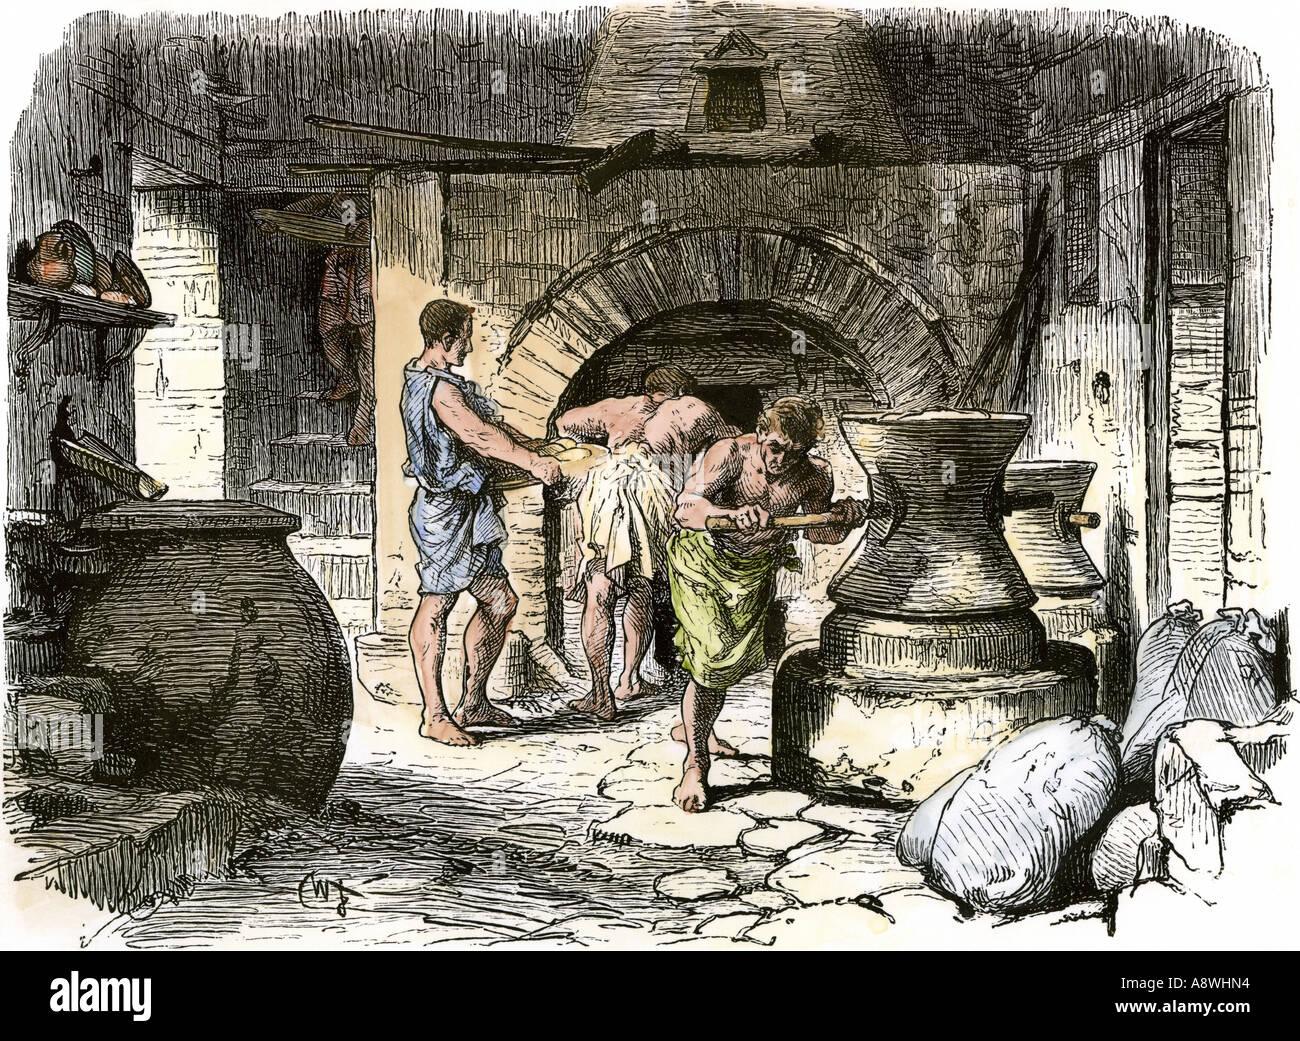 Fast Food Shop Pompeii